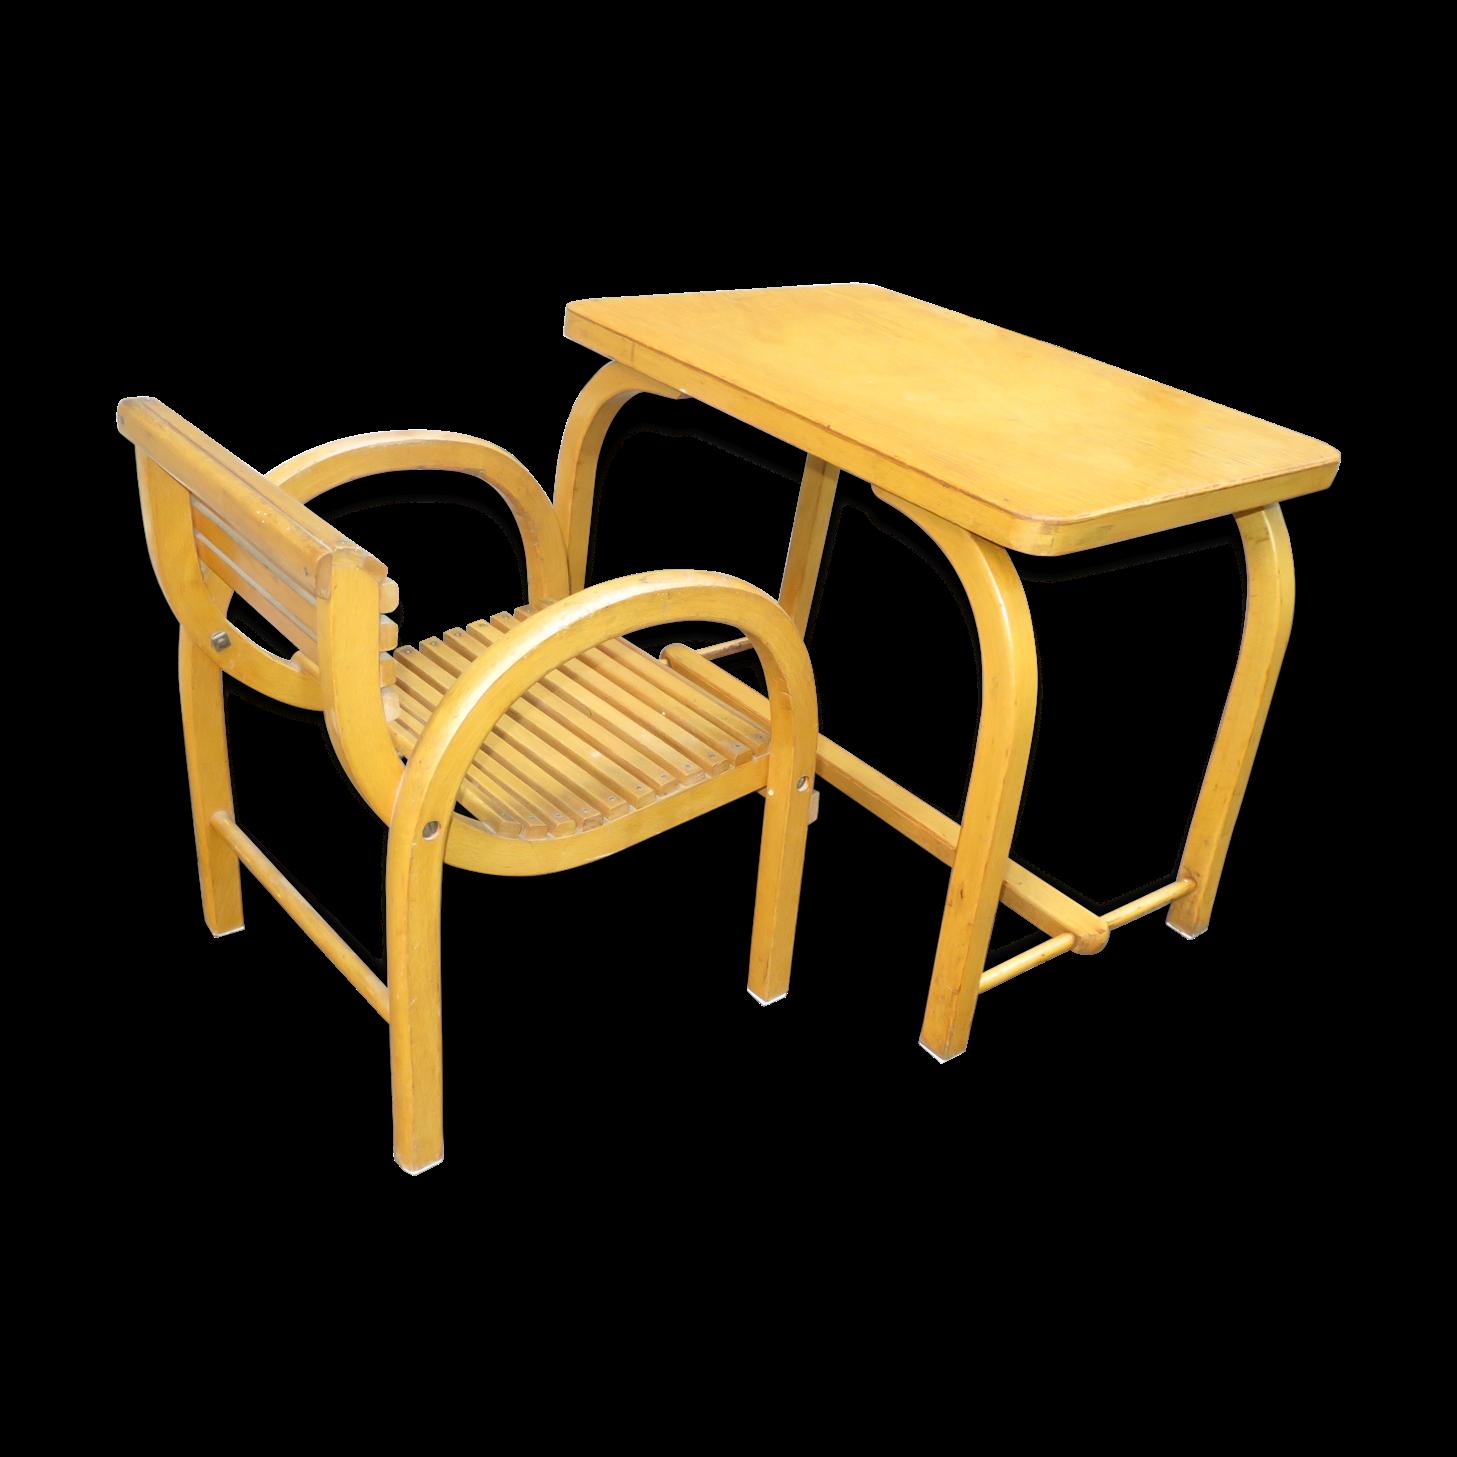 bureau original enfant elegant meubles et linge de tablebureau junior architekt with bureau. Black Bedroom Furniture Sets. Home Design Ideas